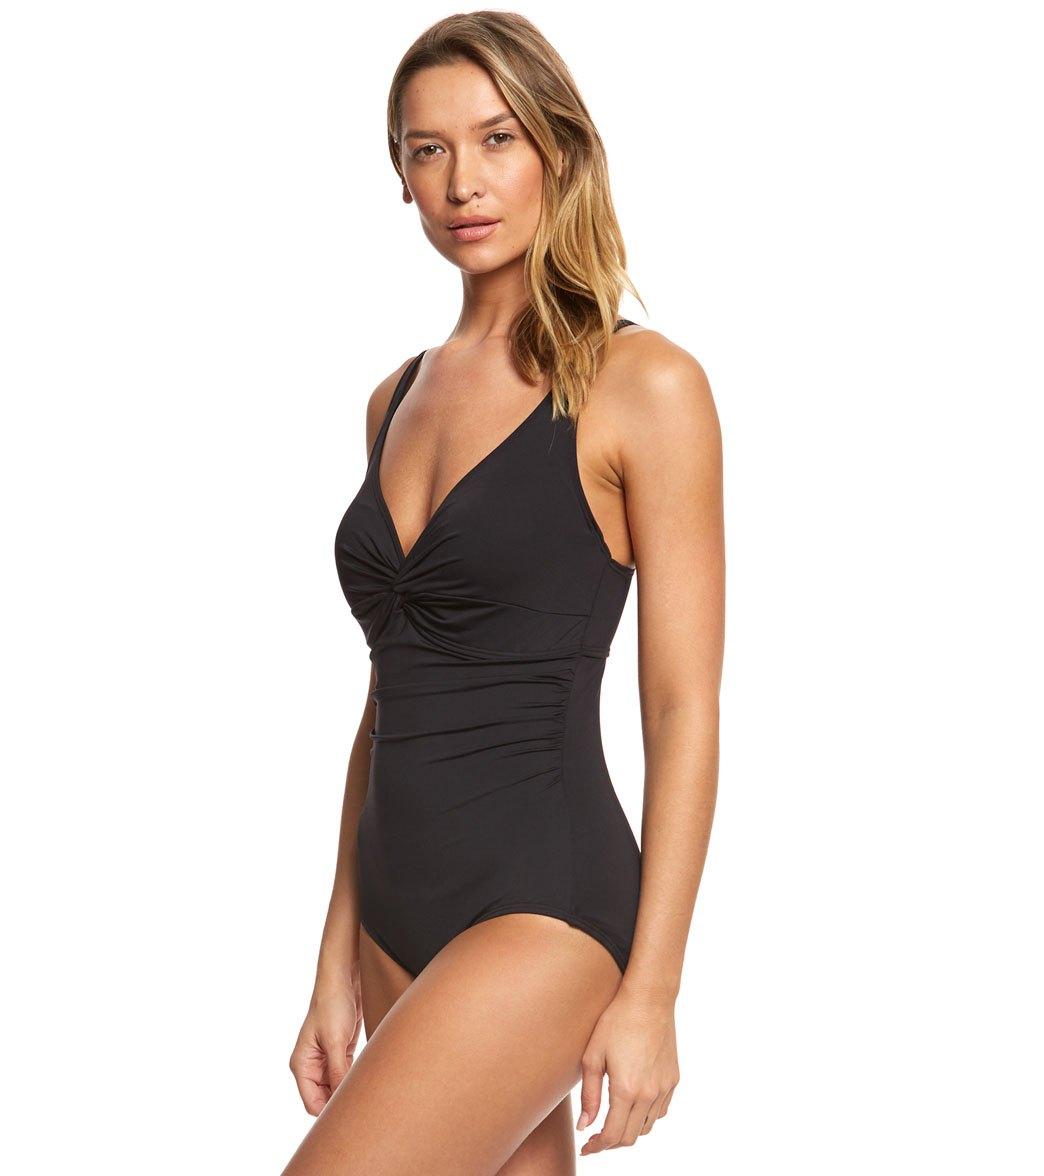 b04f8a76f10ac Coco Reef Contours Keepsake Sapphire Twist One Piece Swimsuit (B/C Cup)